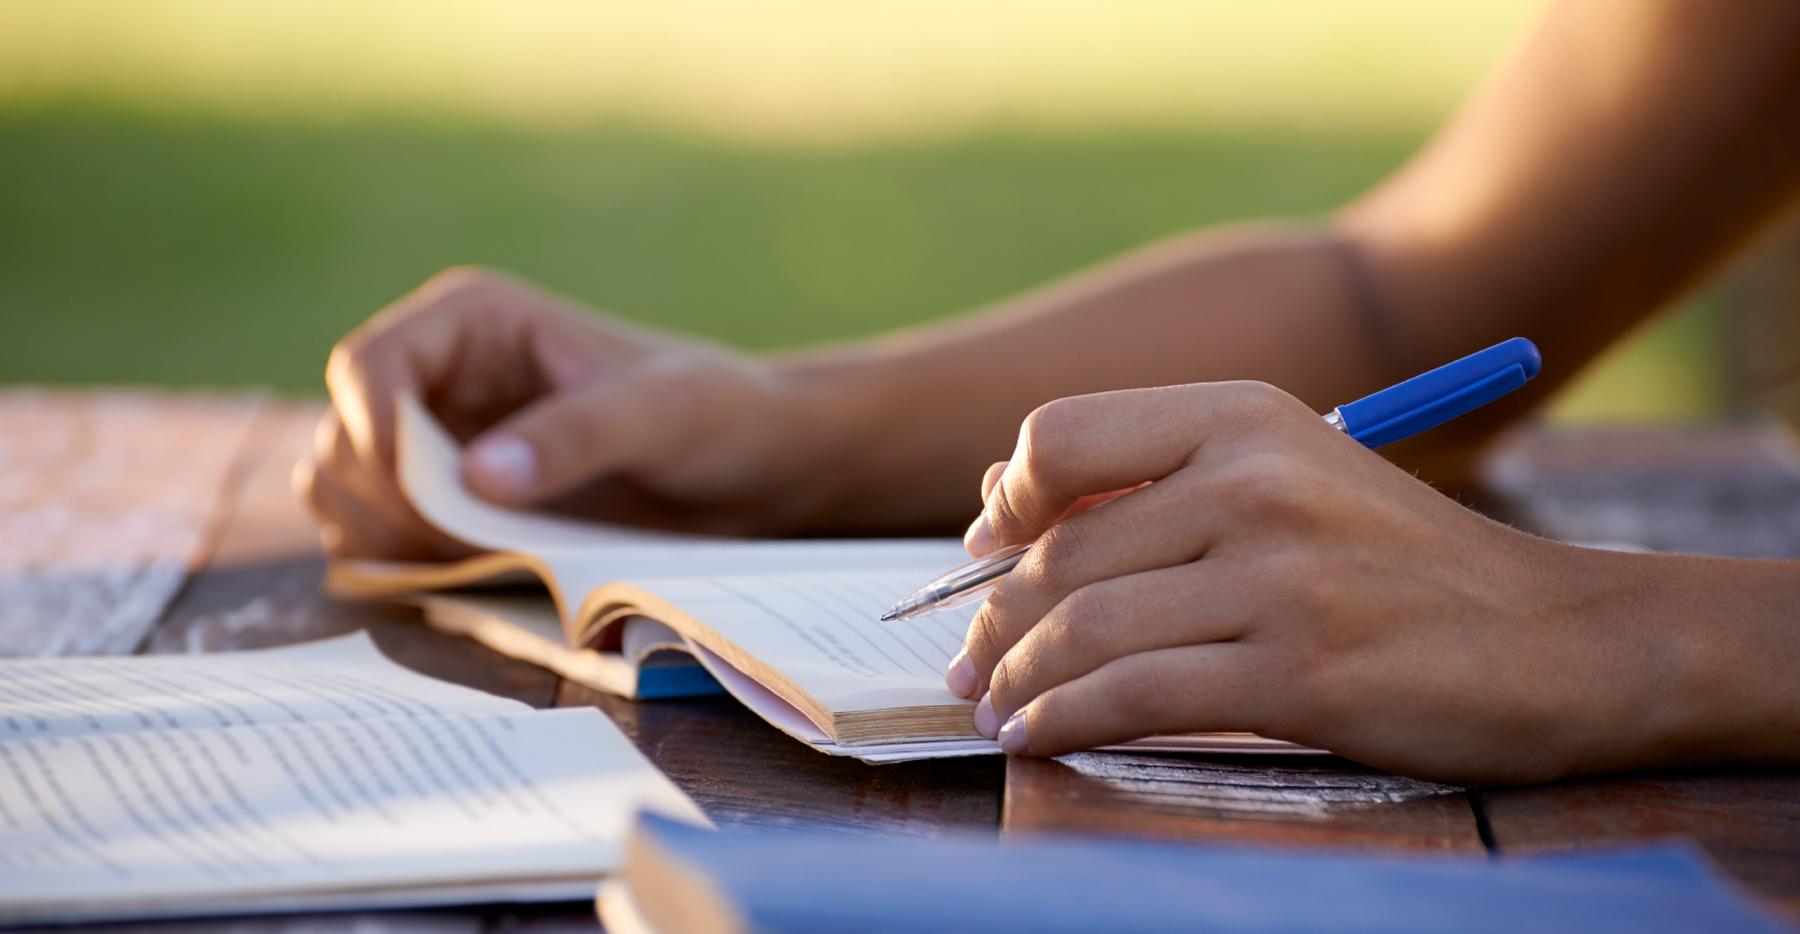 Benefits of using internet essay questions